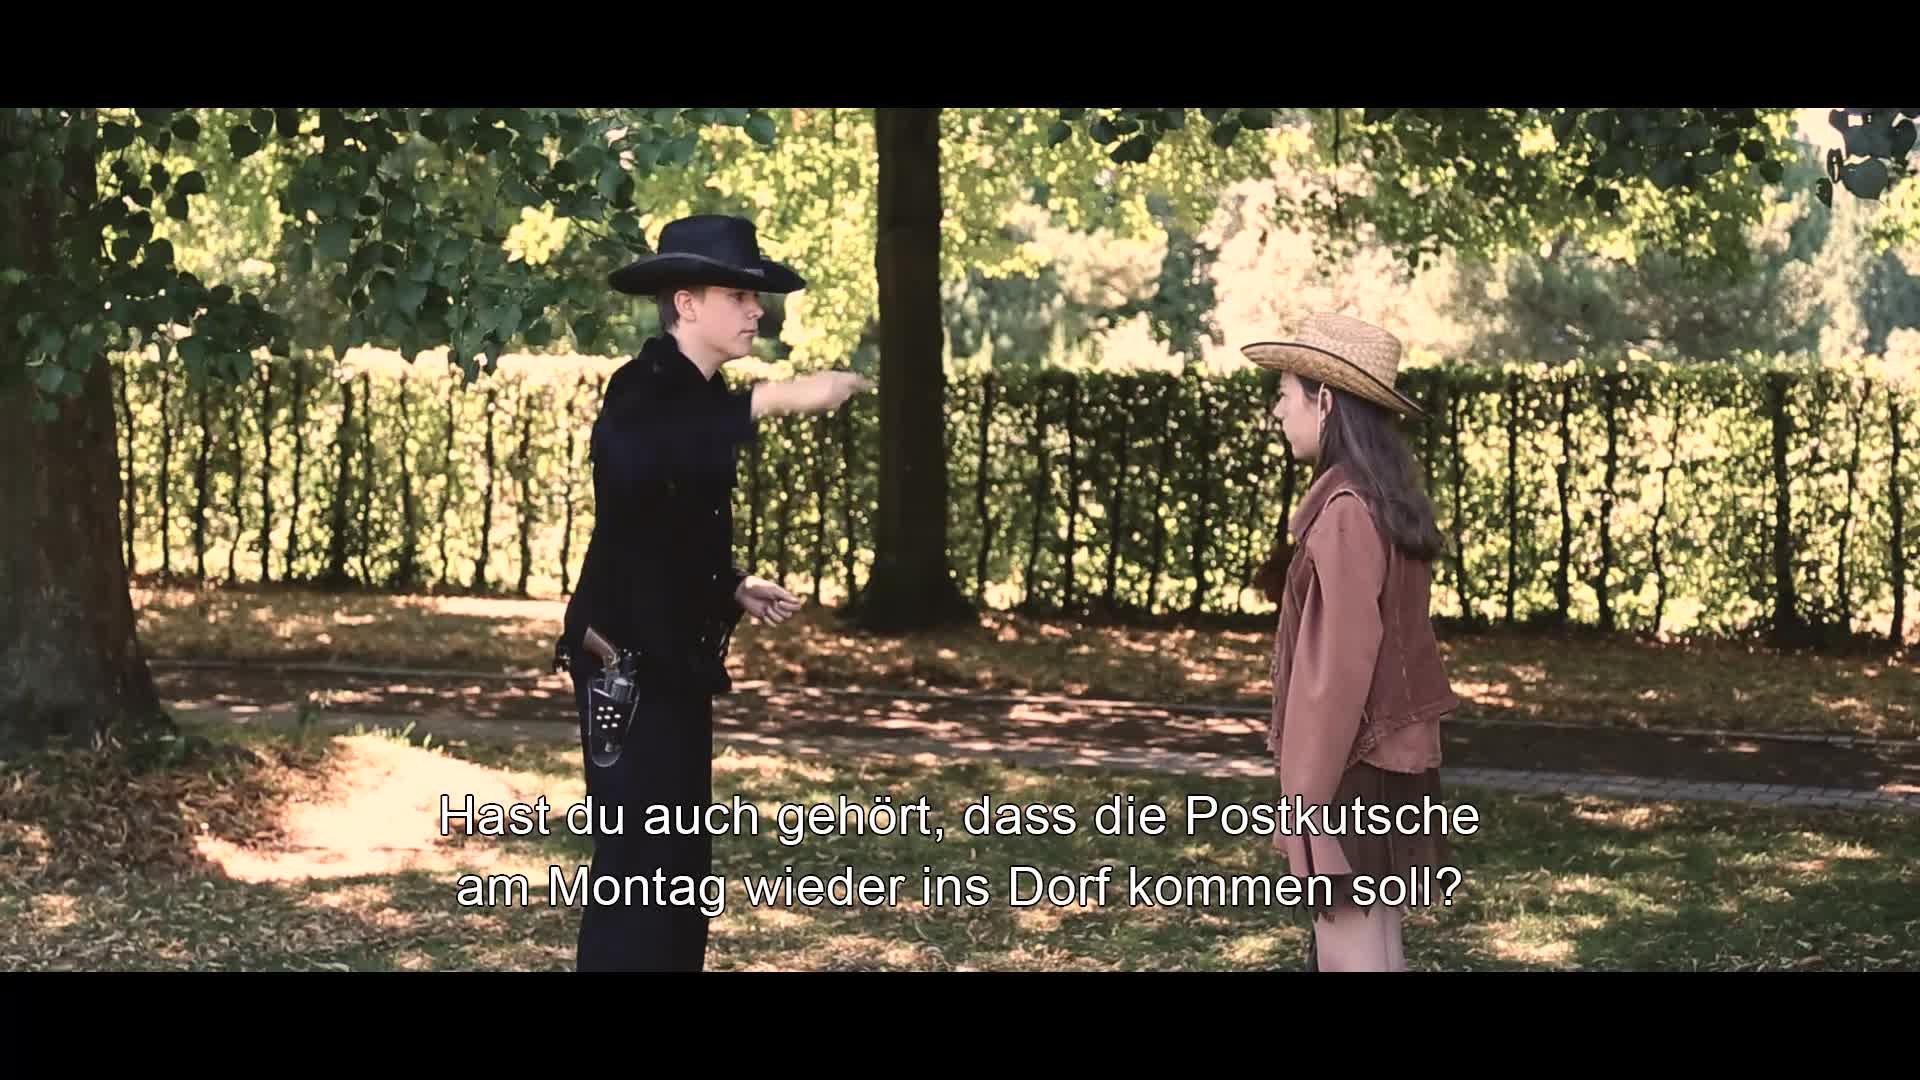 [Film Projekt] 5 Tage, 10 Filme! Tag 5: Western war gestern!